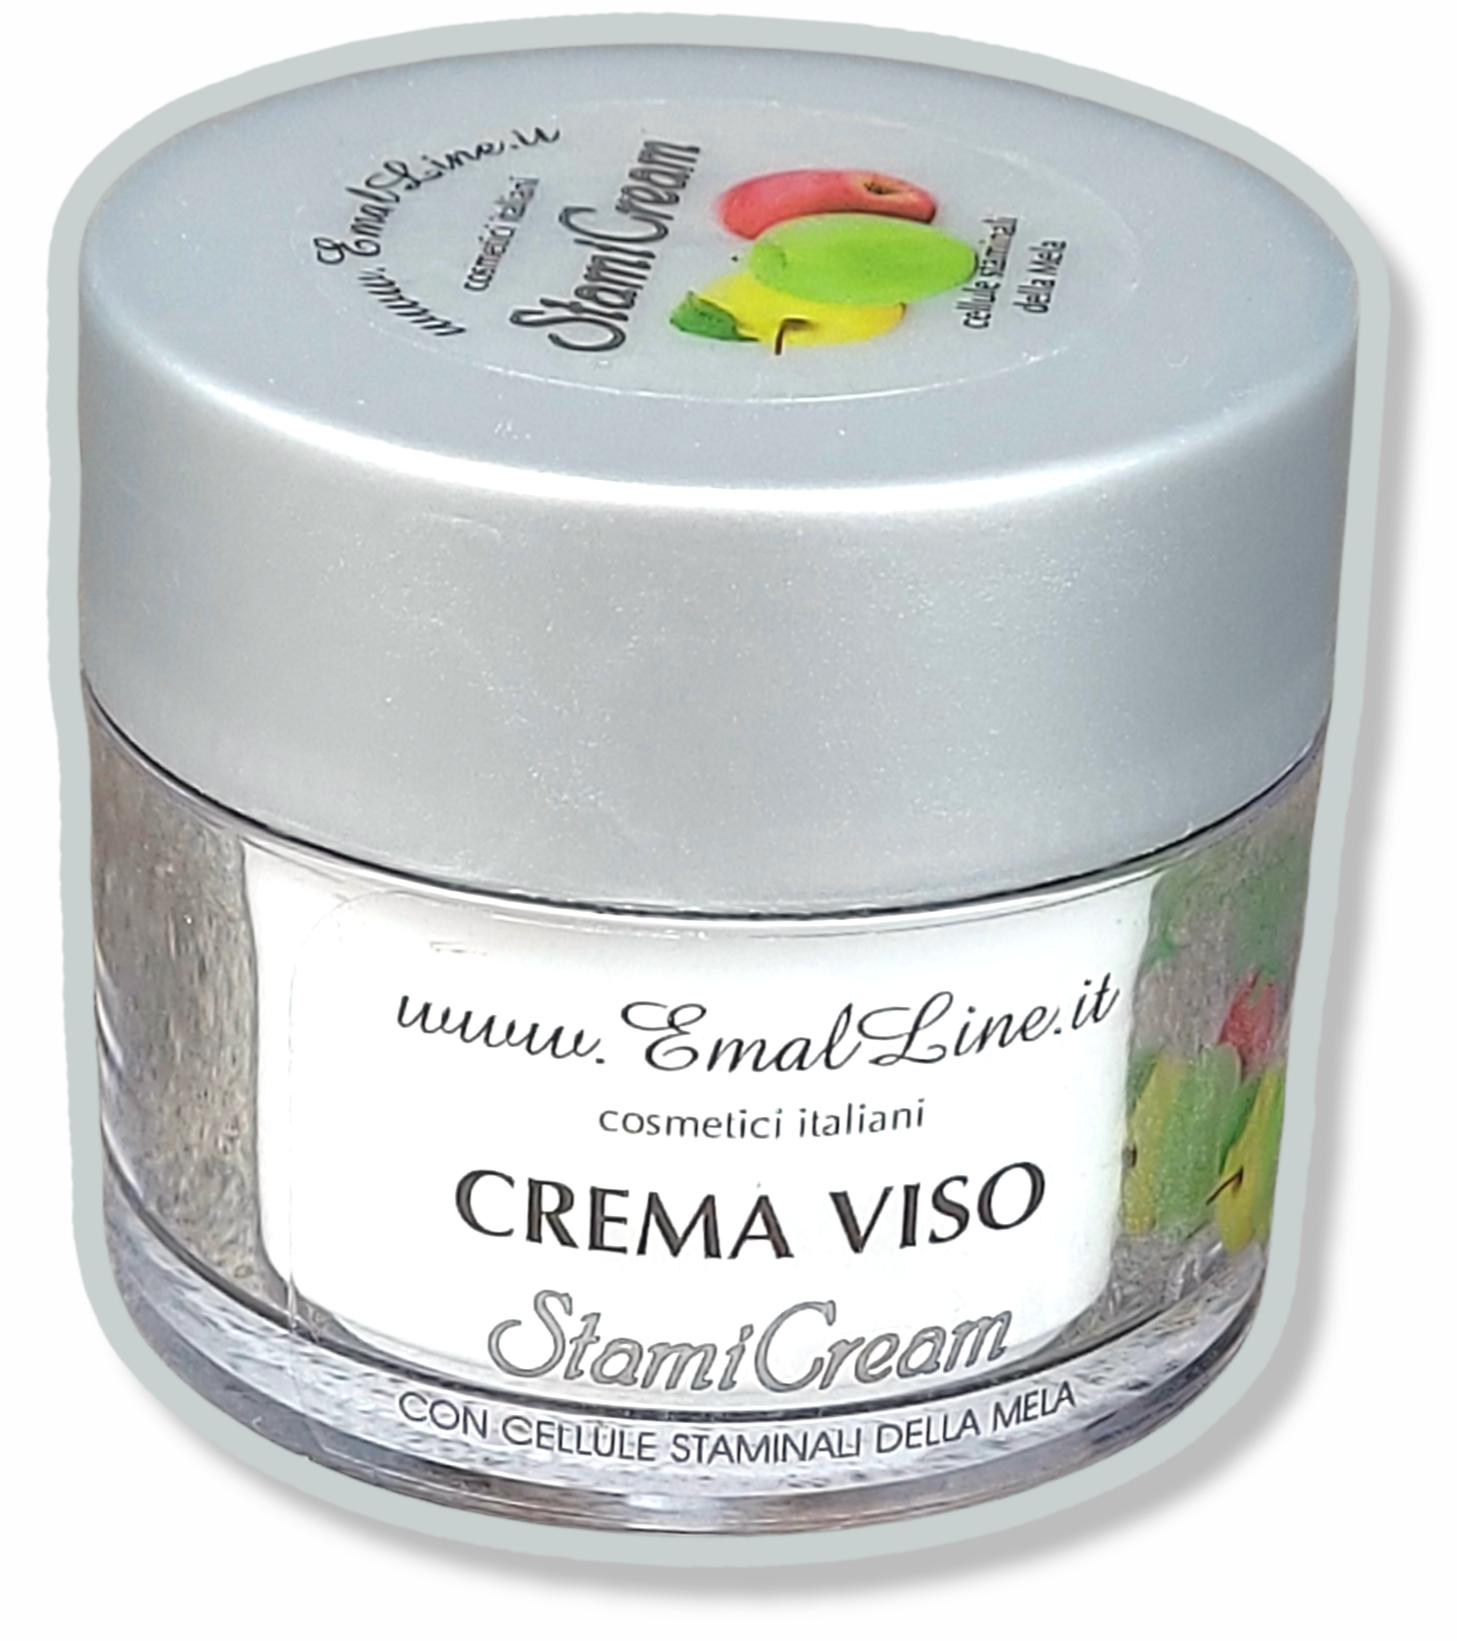 Stami Cream Crema alle cellule staminali della mela 50 ml